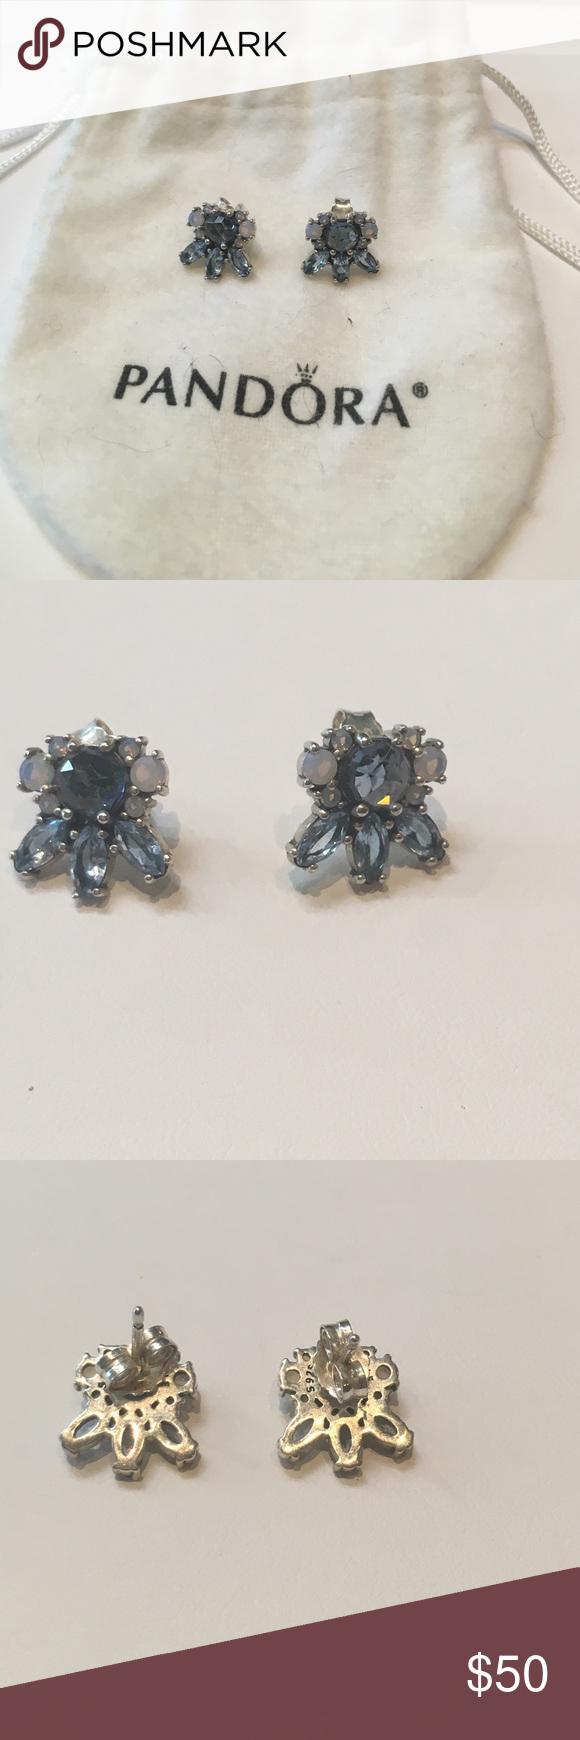 7ddba2de4 ... good pandora sterling patterns of frost earrings pandora sterling  silver blue topaz and moonstone patterns of